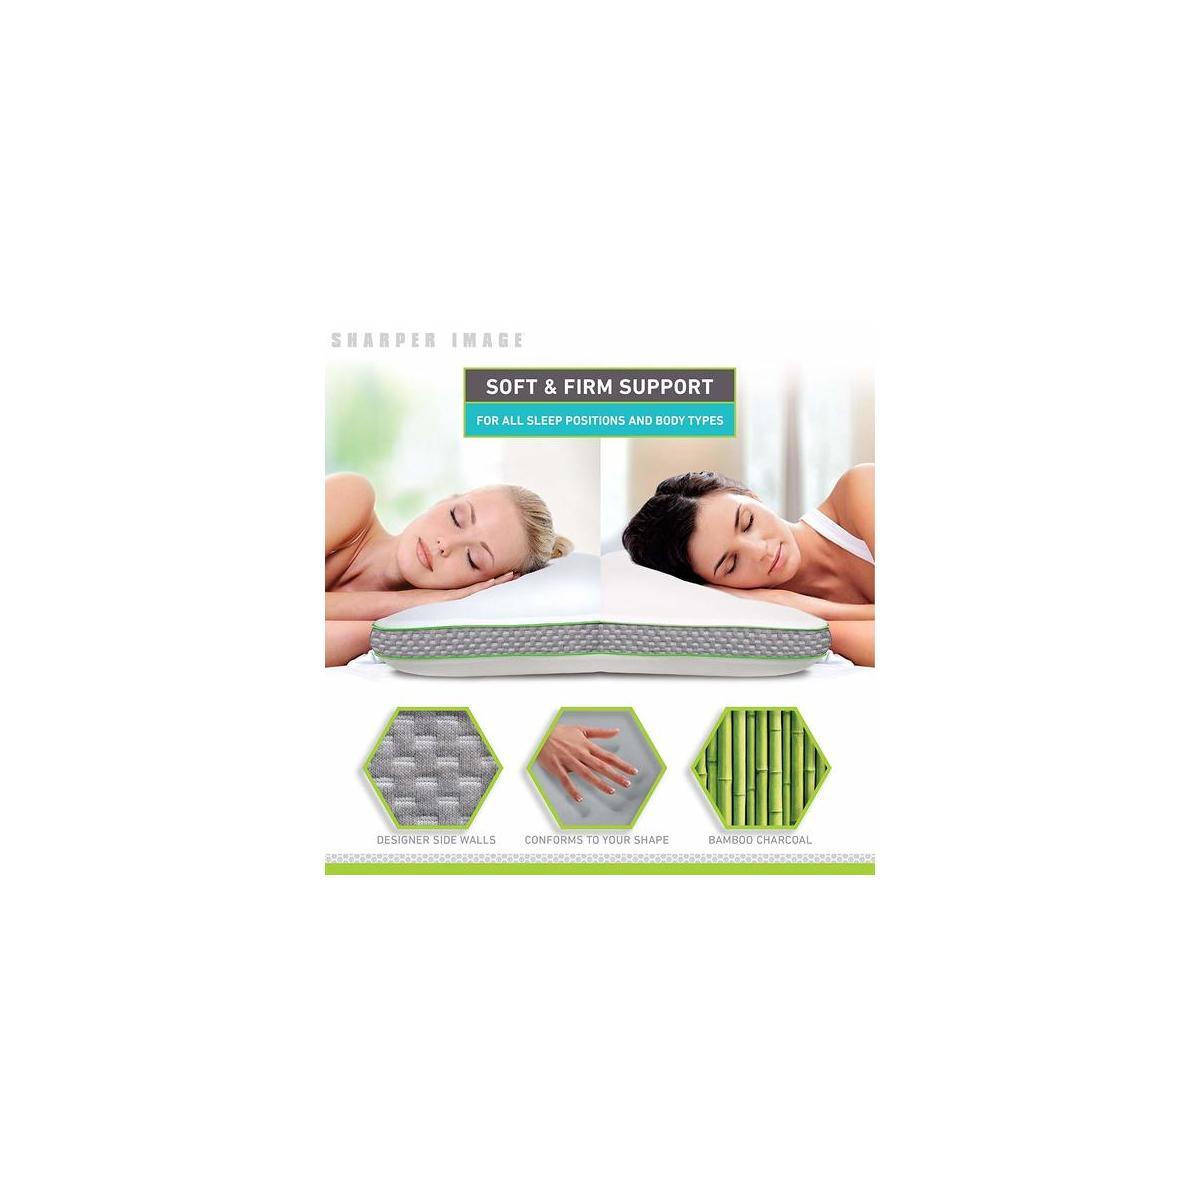 sharper image select a side molded memory foam pillow